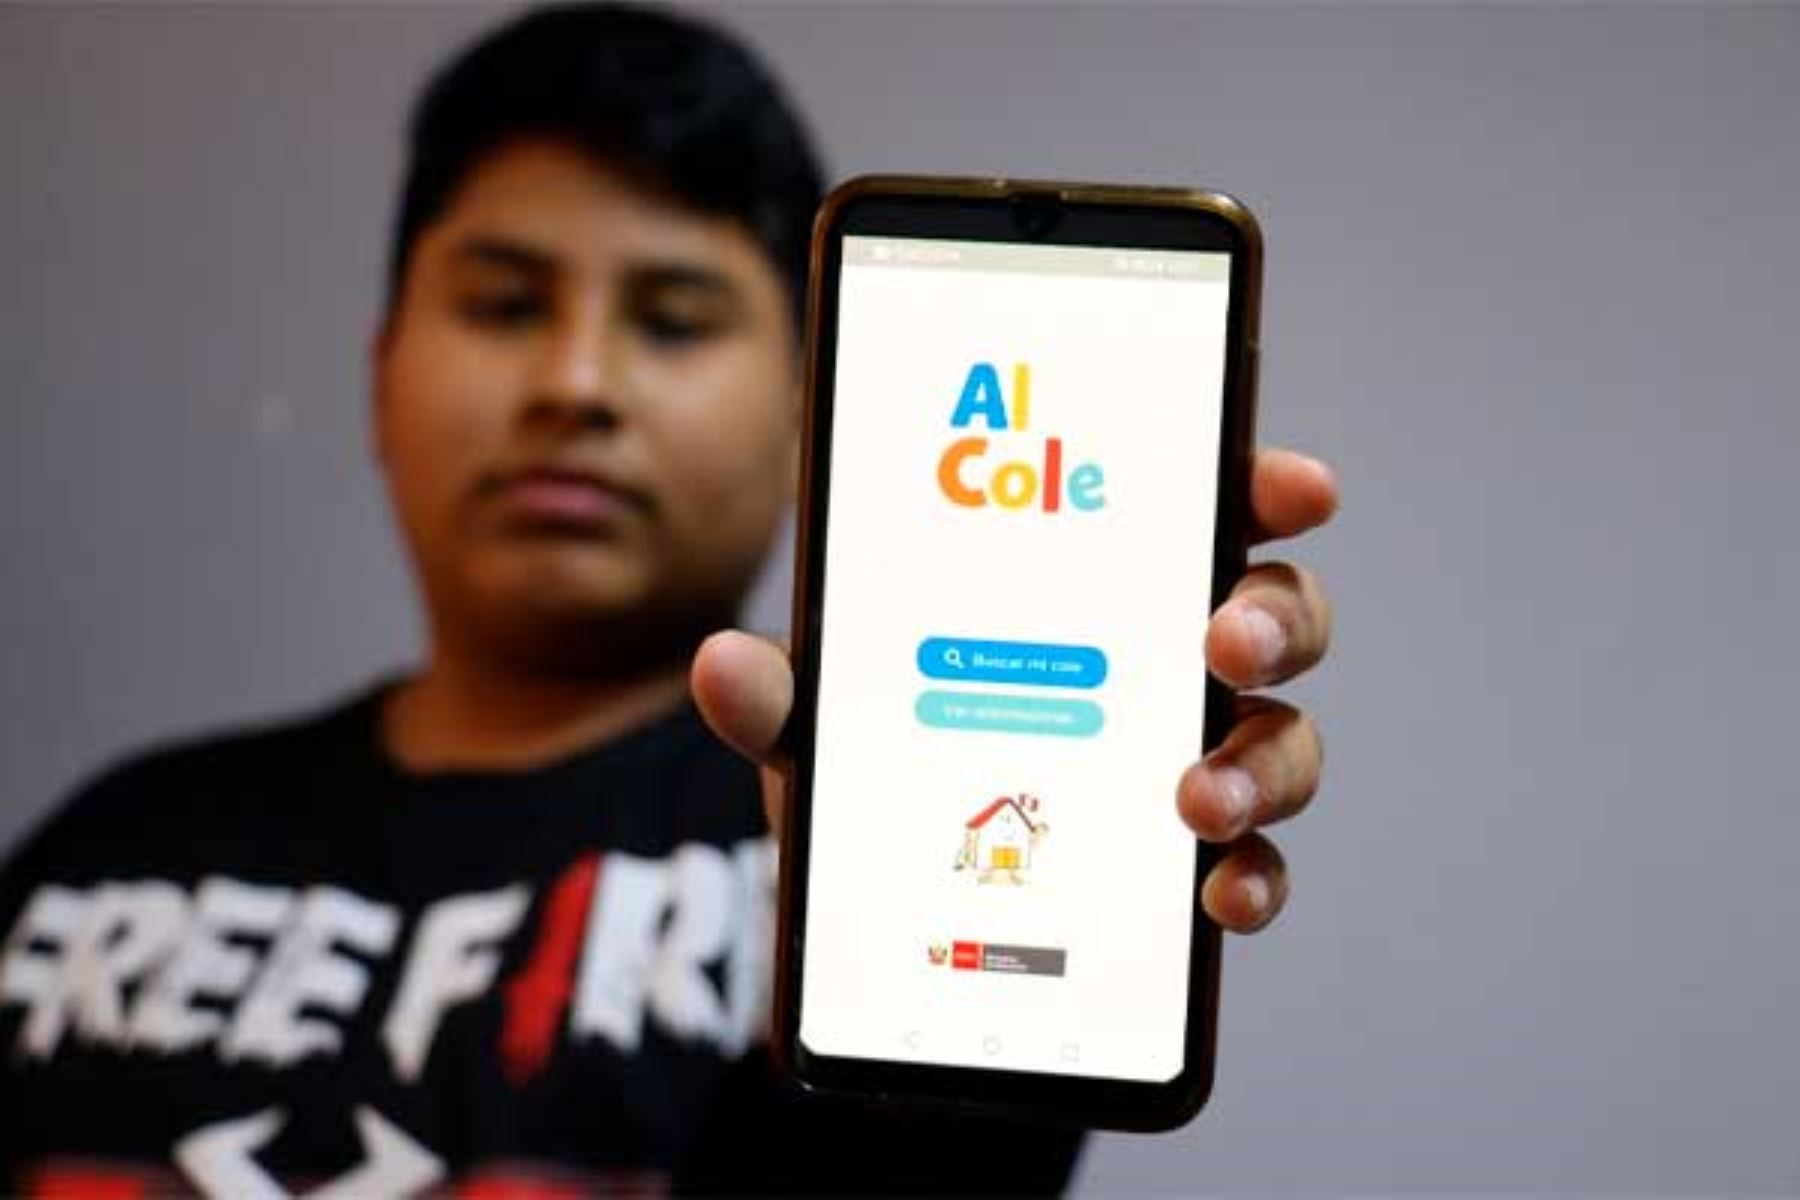 App del Minedu también explica la ruta para un retorno seguro a clases presenciales. Foto: ANDINA/Minedu